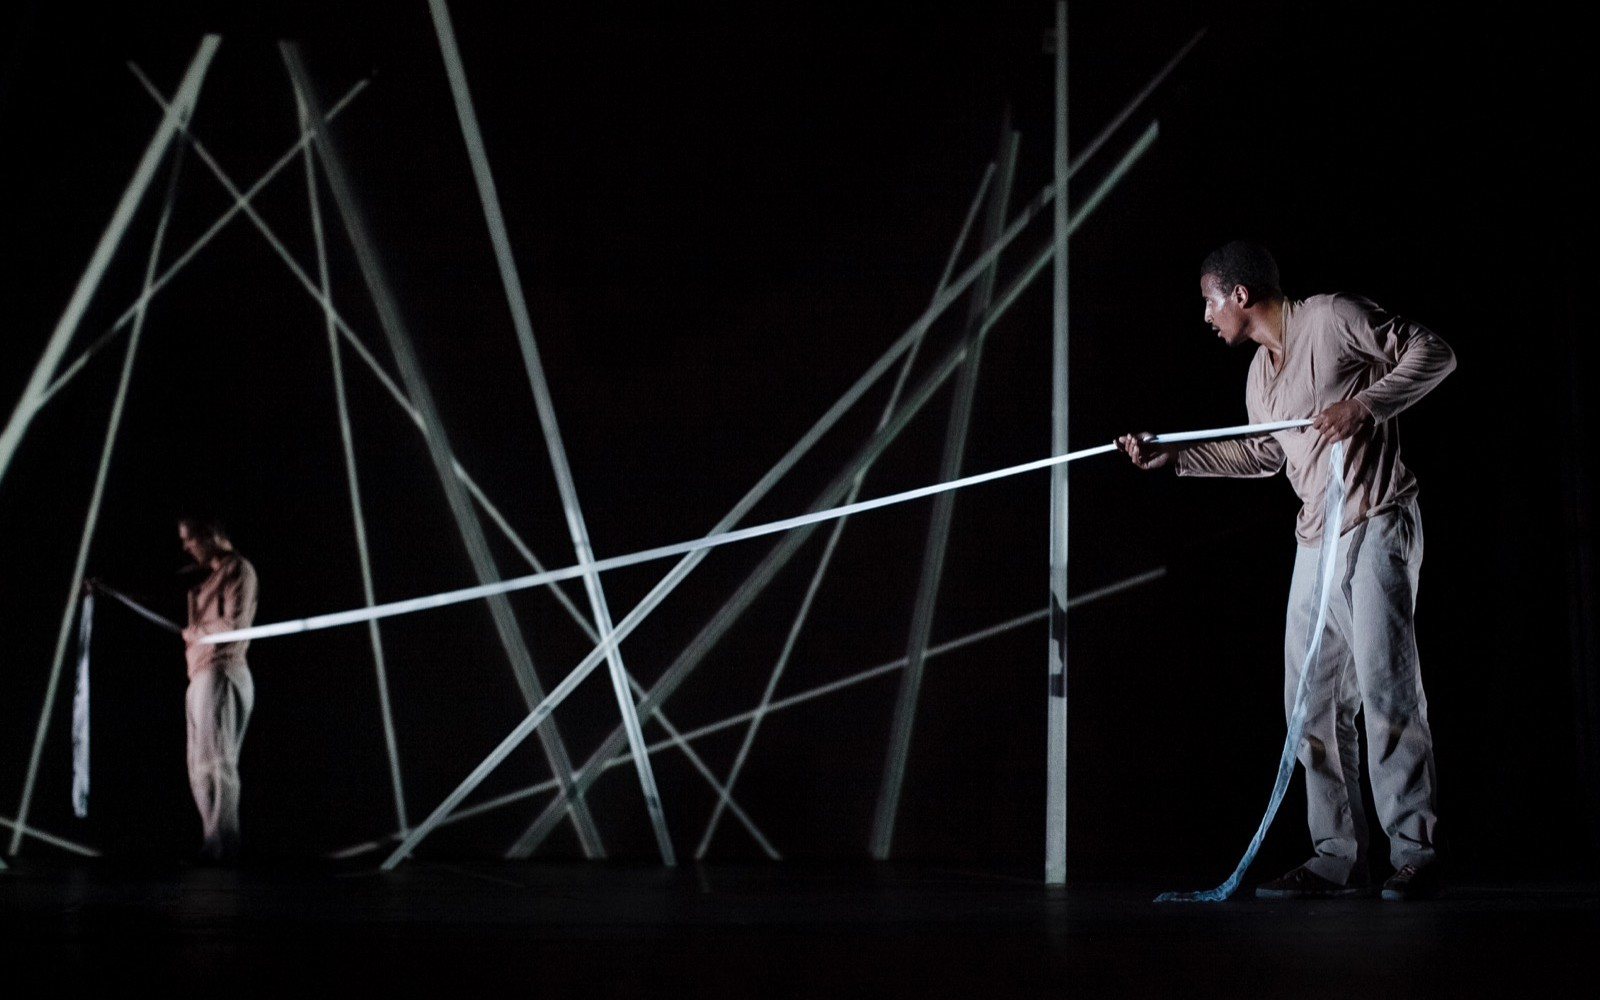 Pow2045 – Generative design meets urban choreography